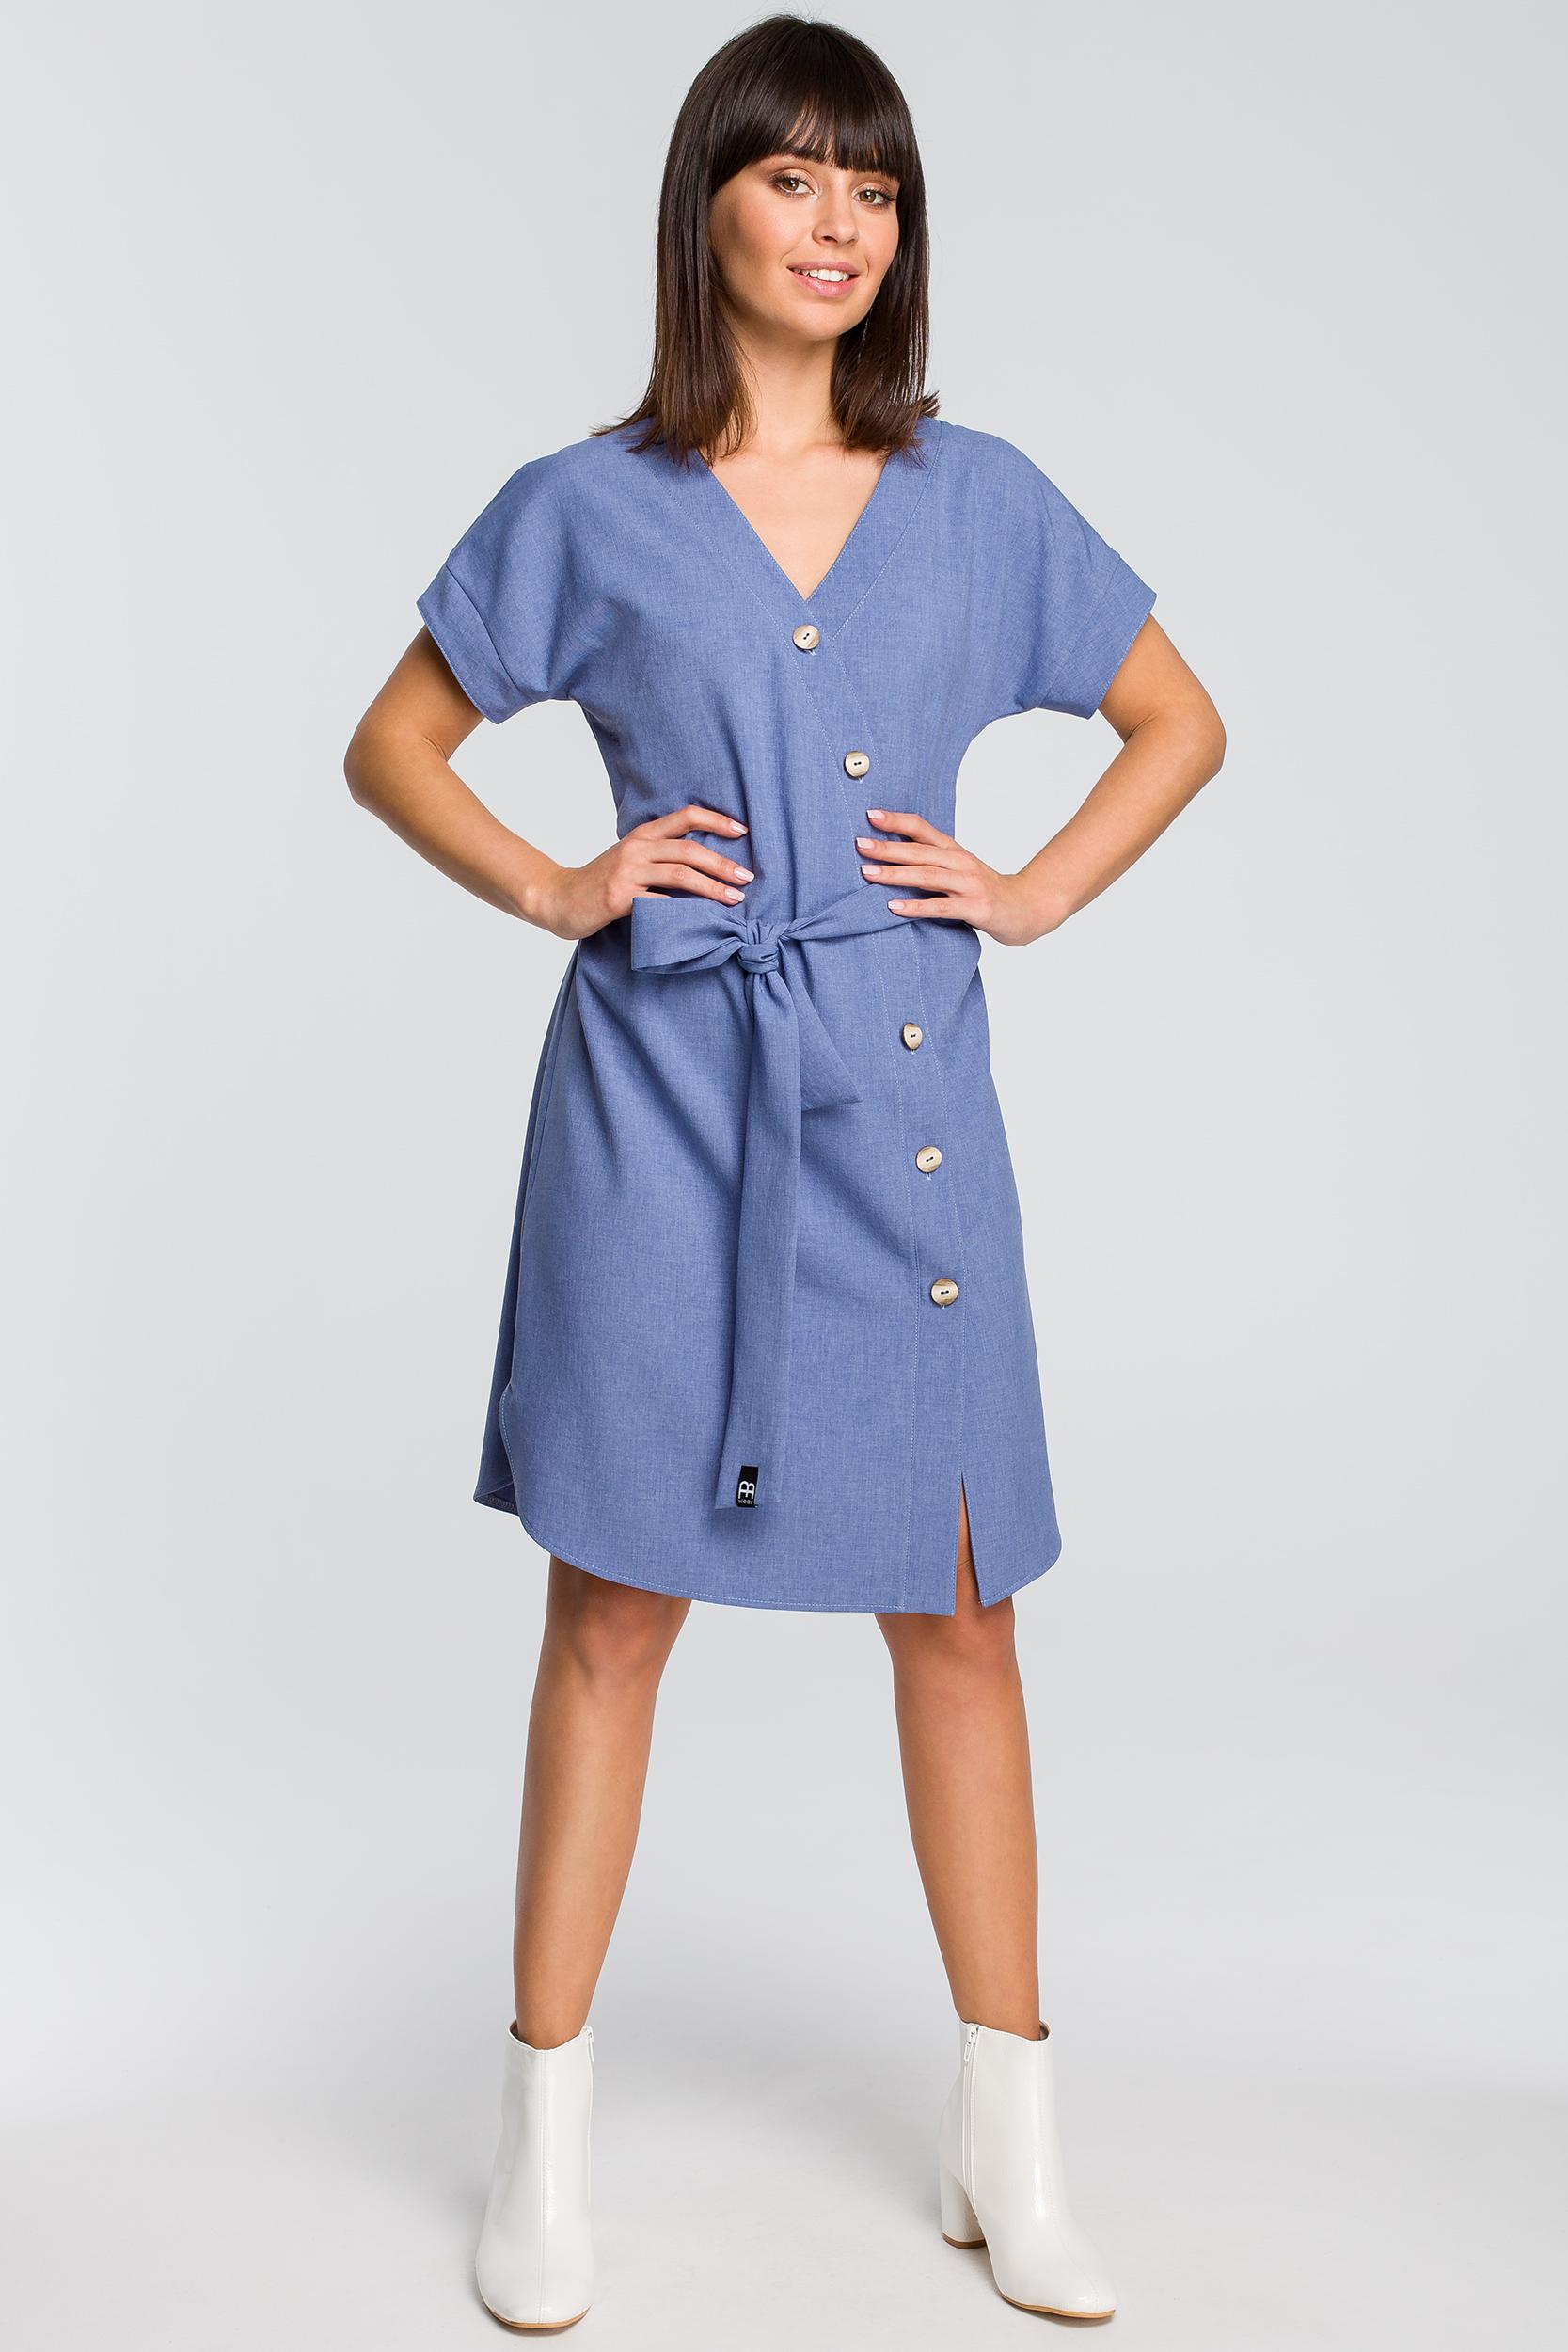 Sukienka zapinana na guziki niebieska